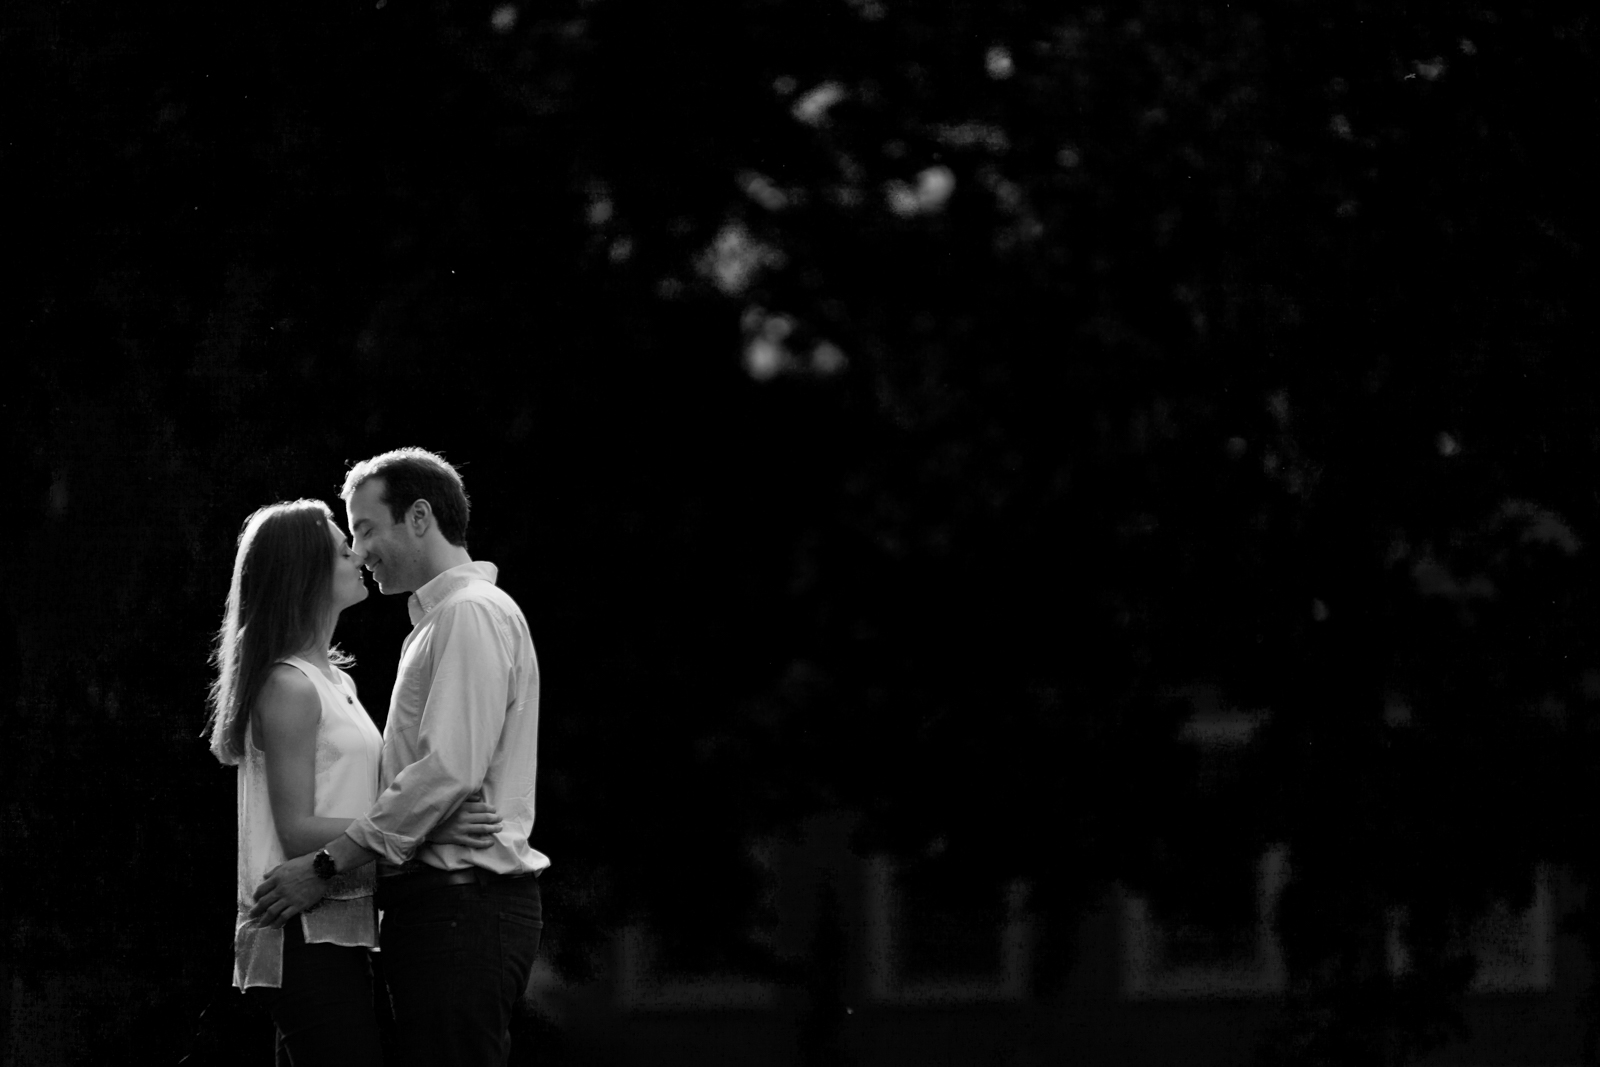 Jorie+Chip+Chicago+Engagement-47.jpg